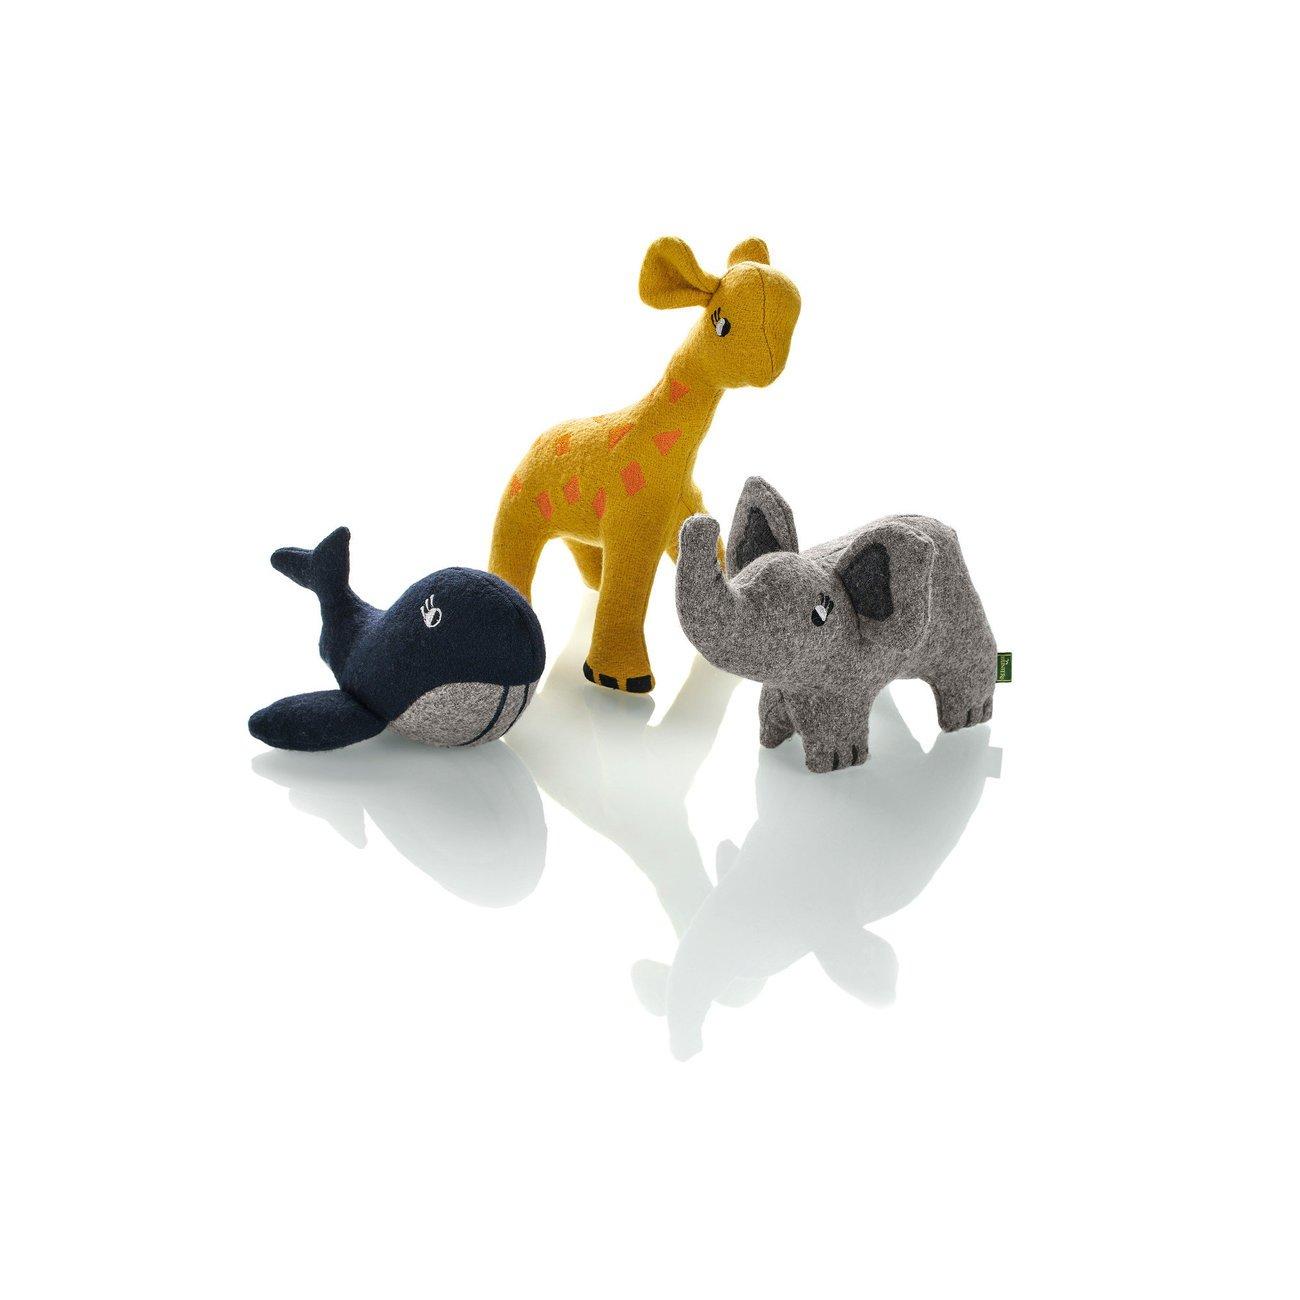 Hunter Hundespielzeug Eiby 68642, Bild 10